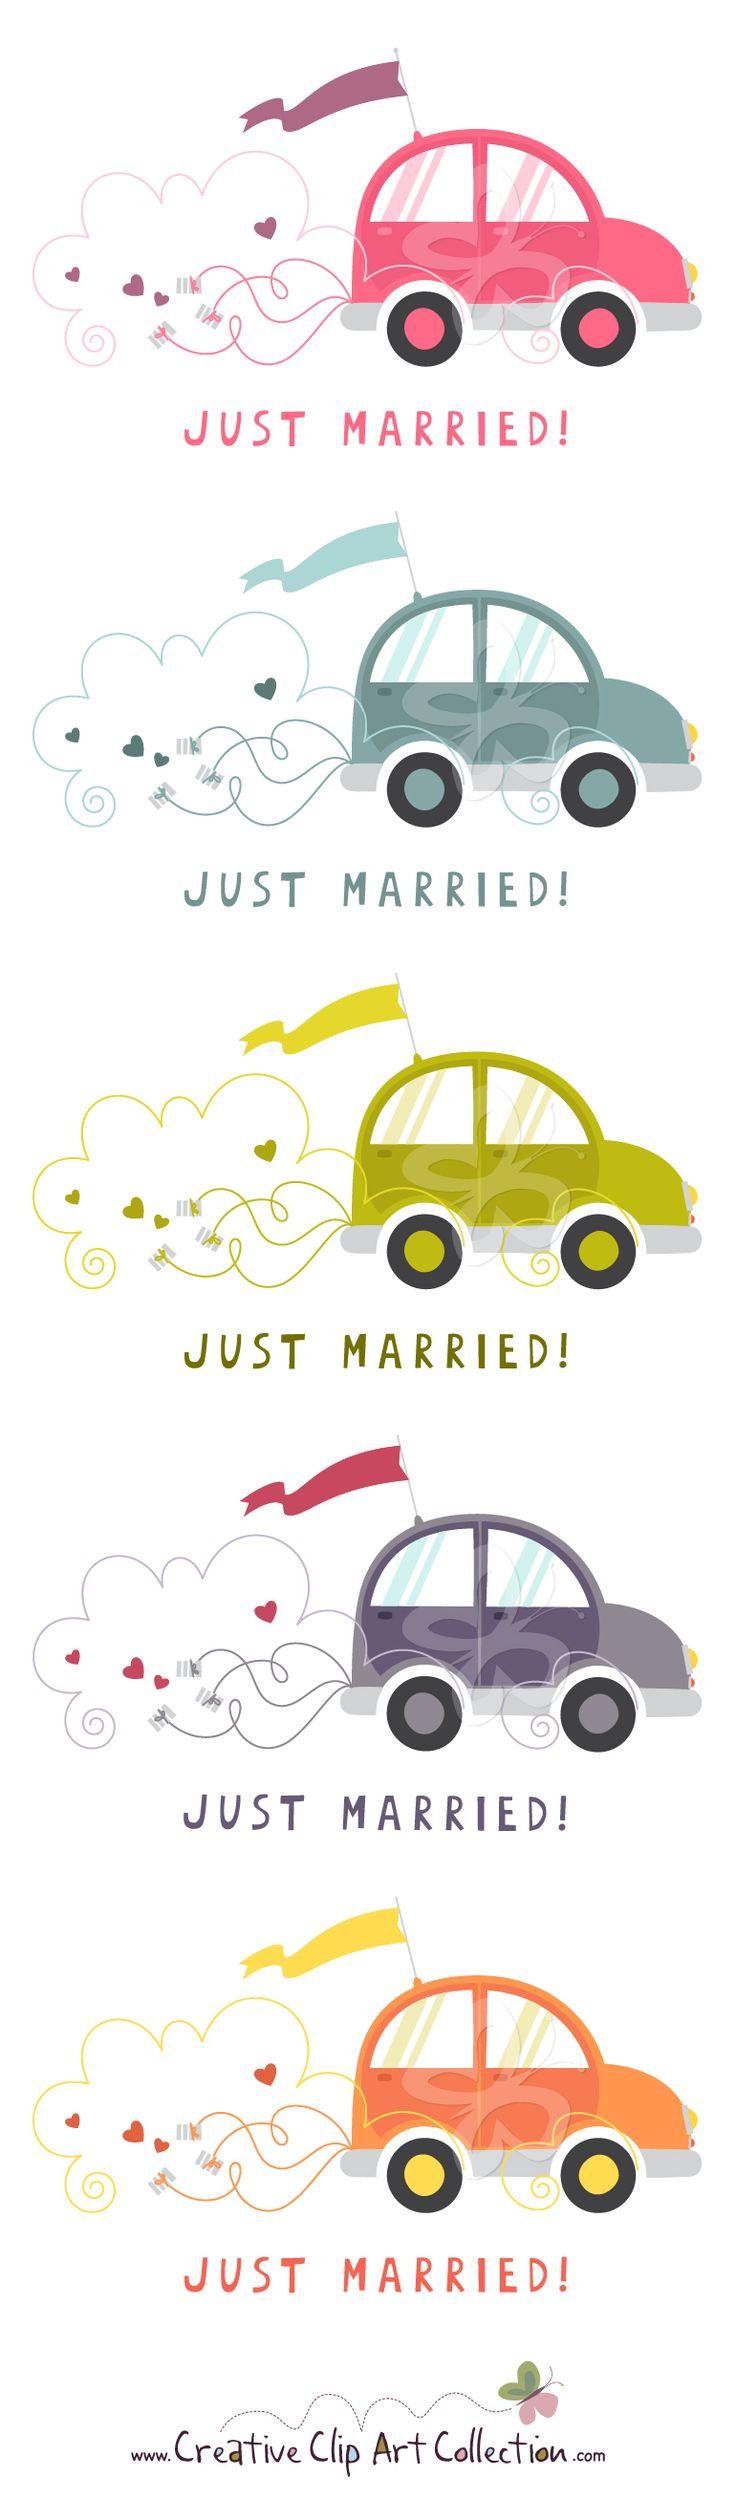 11 best Wedding Clip Art images on Pinterest | Wedding clip art, Art ...